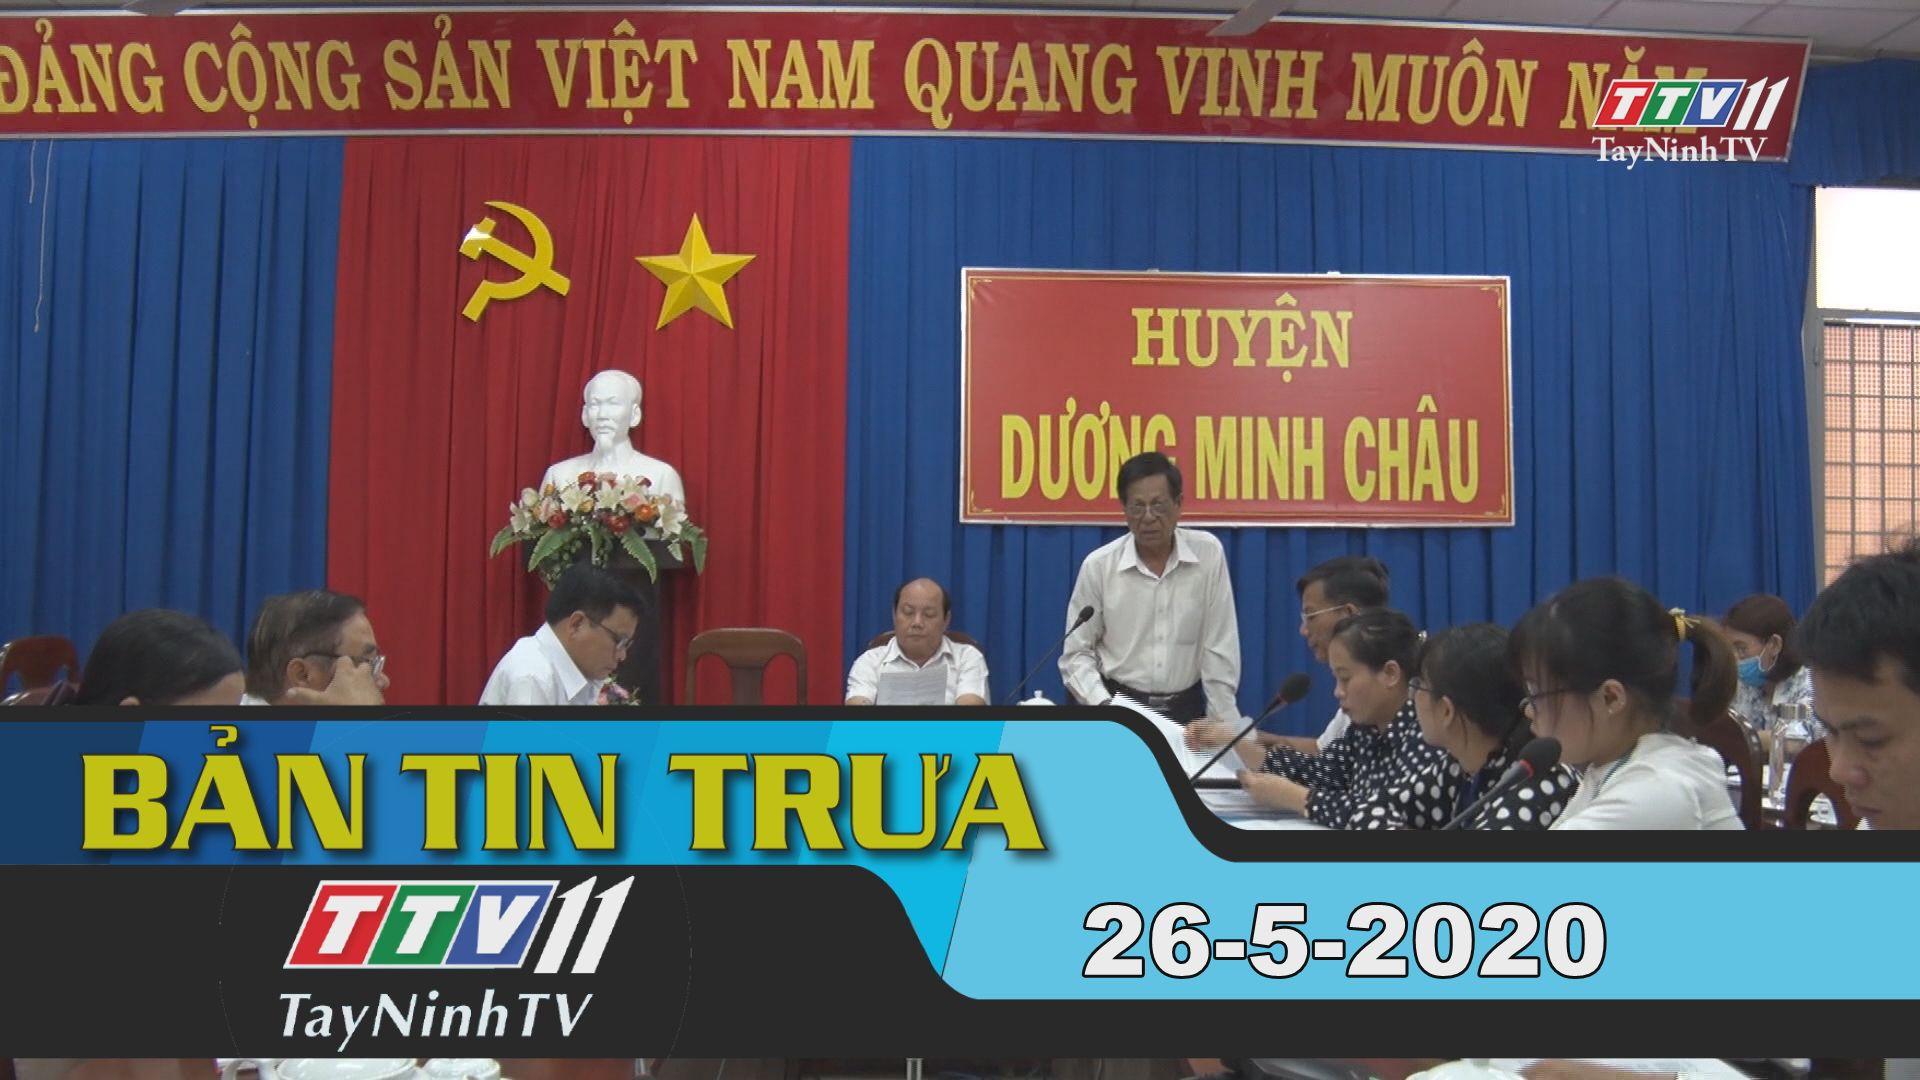 Bản tin trưa 26-5-2020   Tin tức hôm nay   TayNinhTV